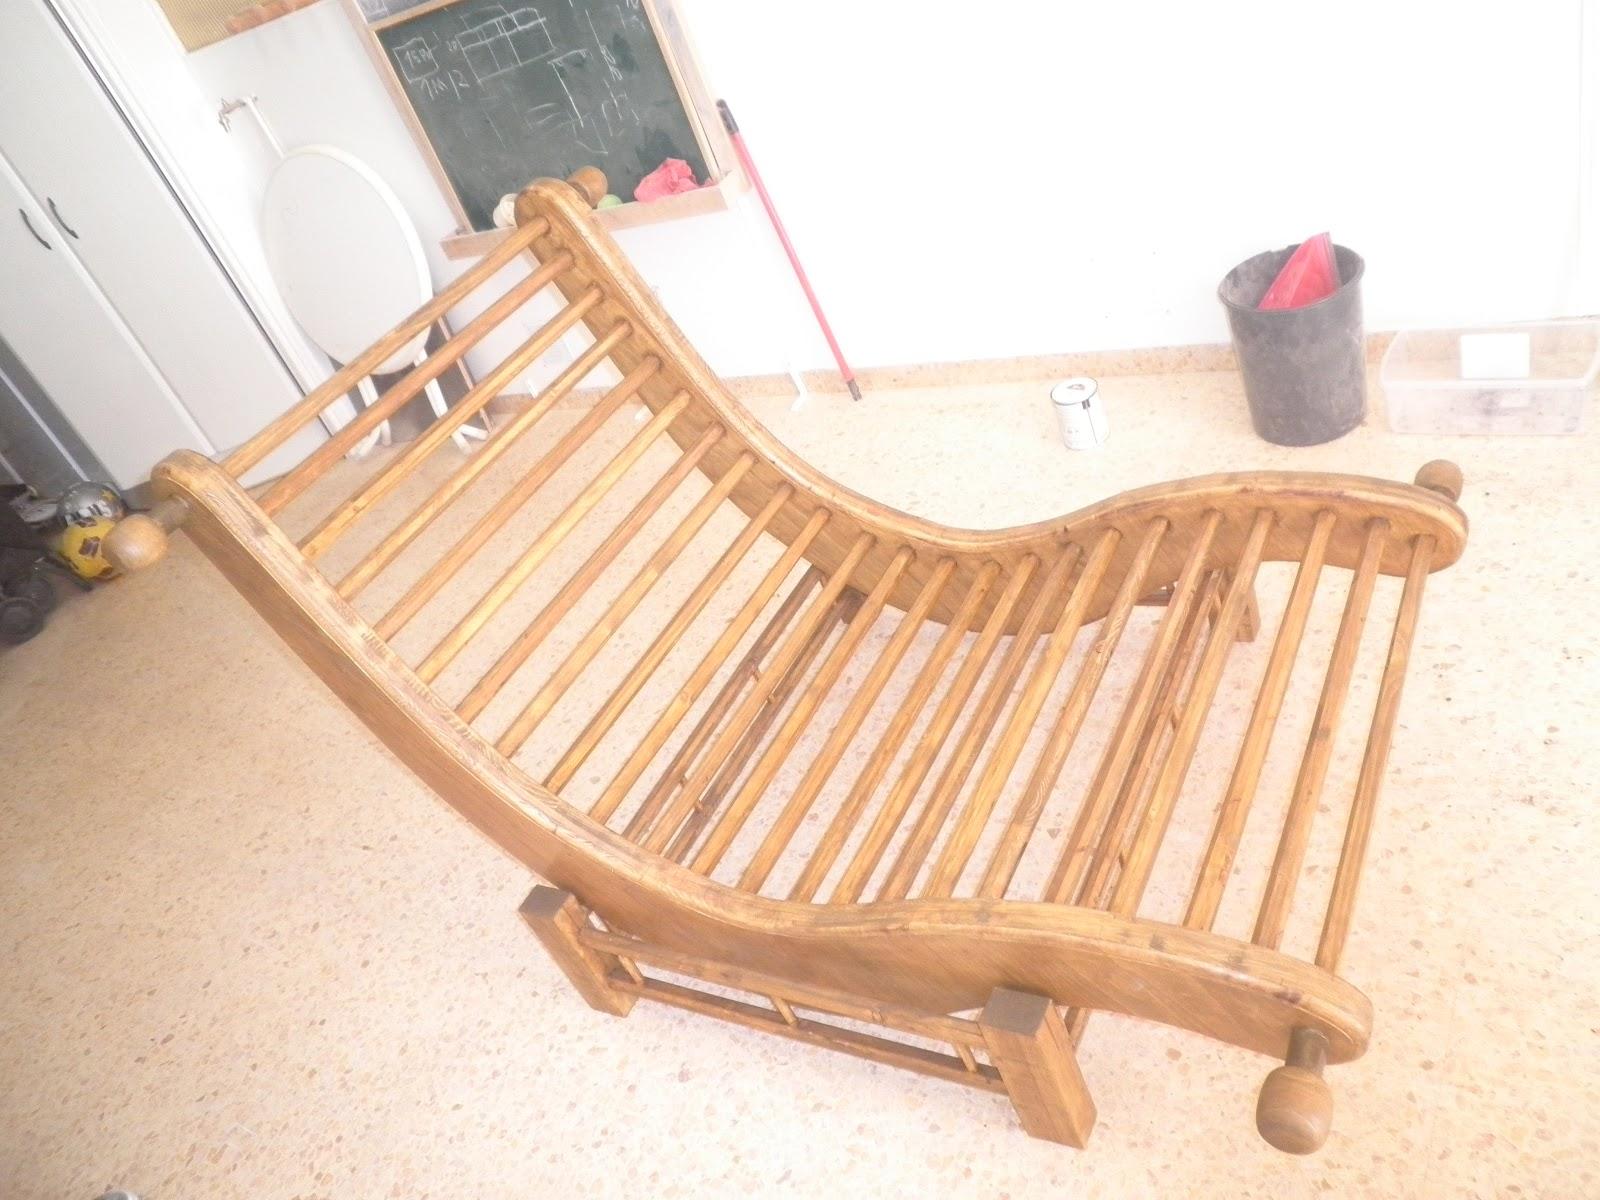 Tumbona mecedora columpio trabajos de madera for Mecedora de madera